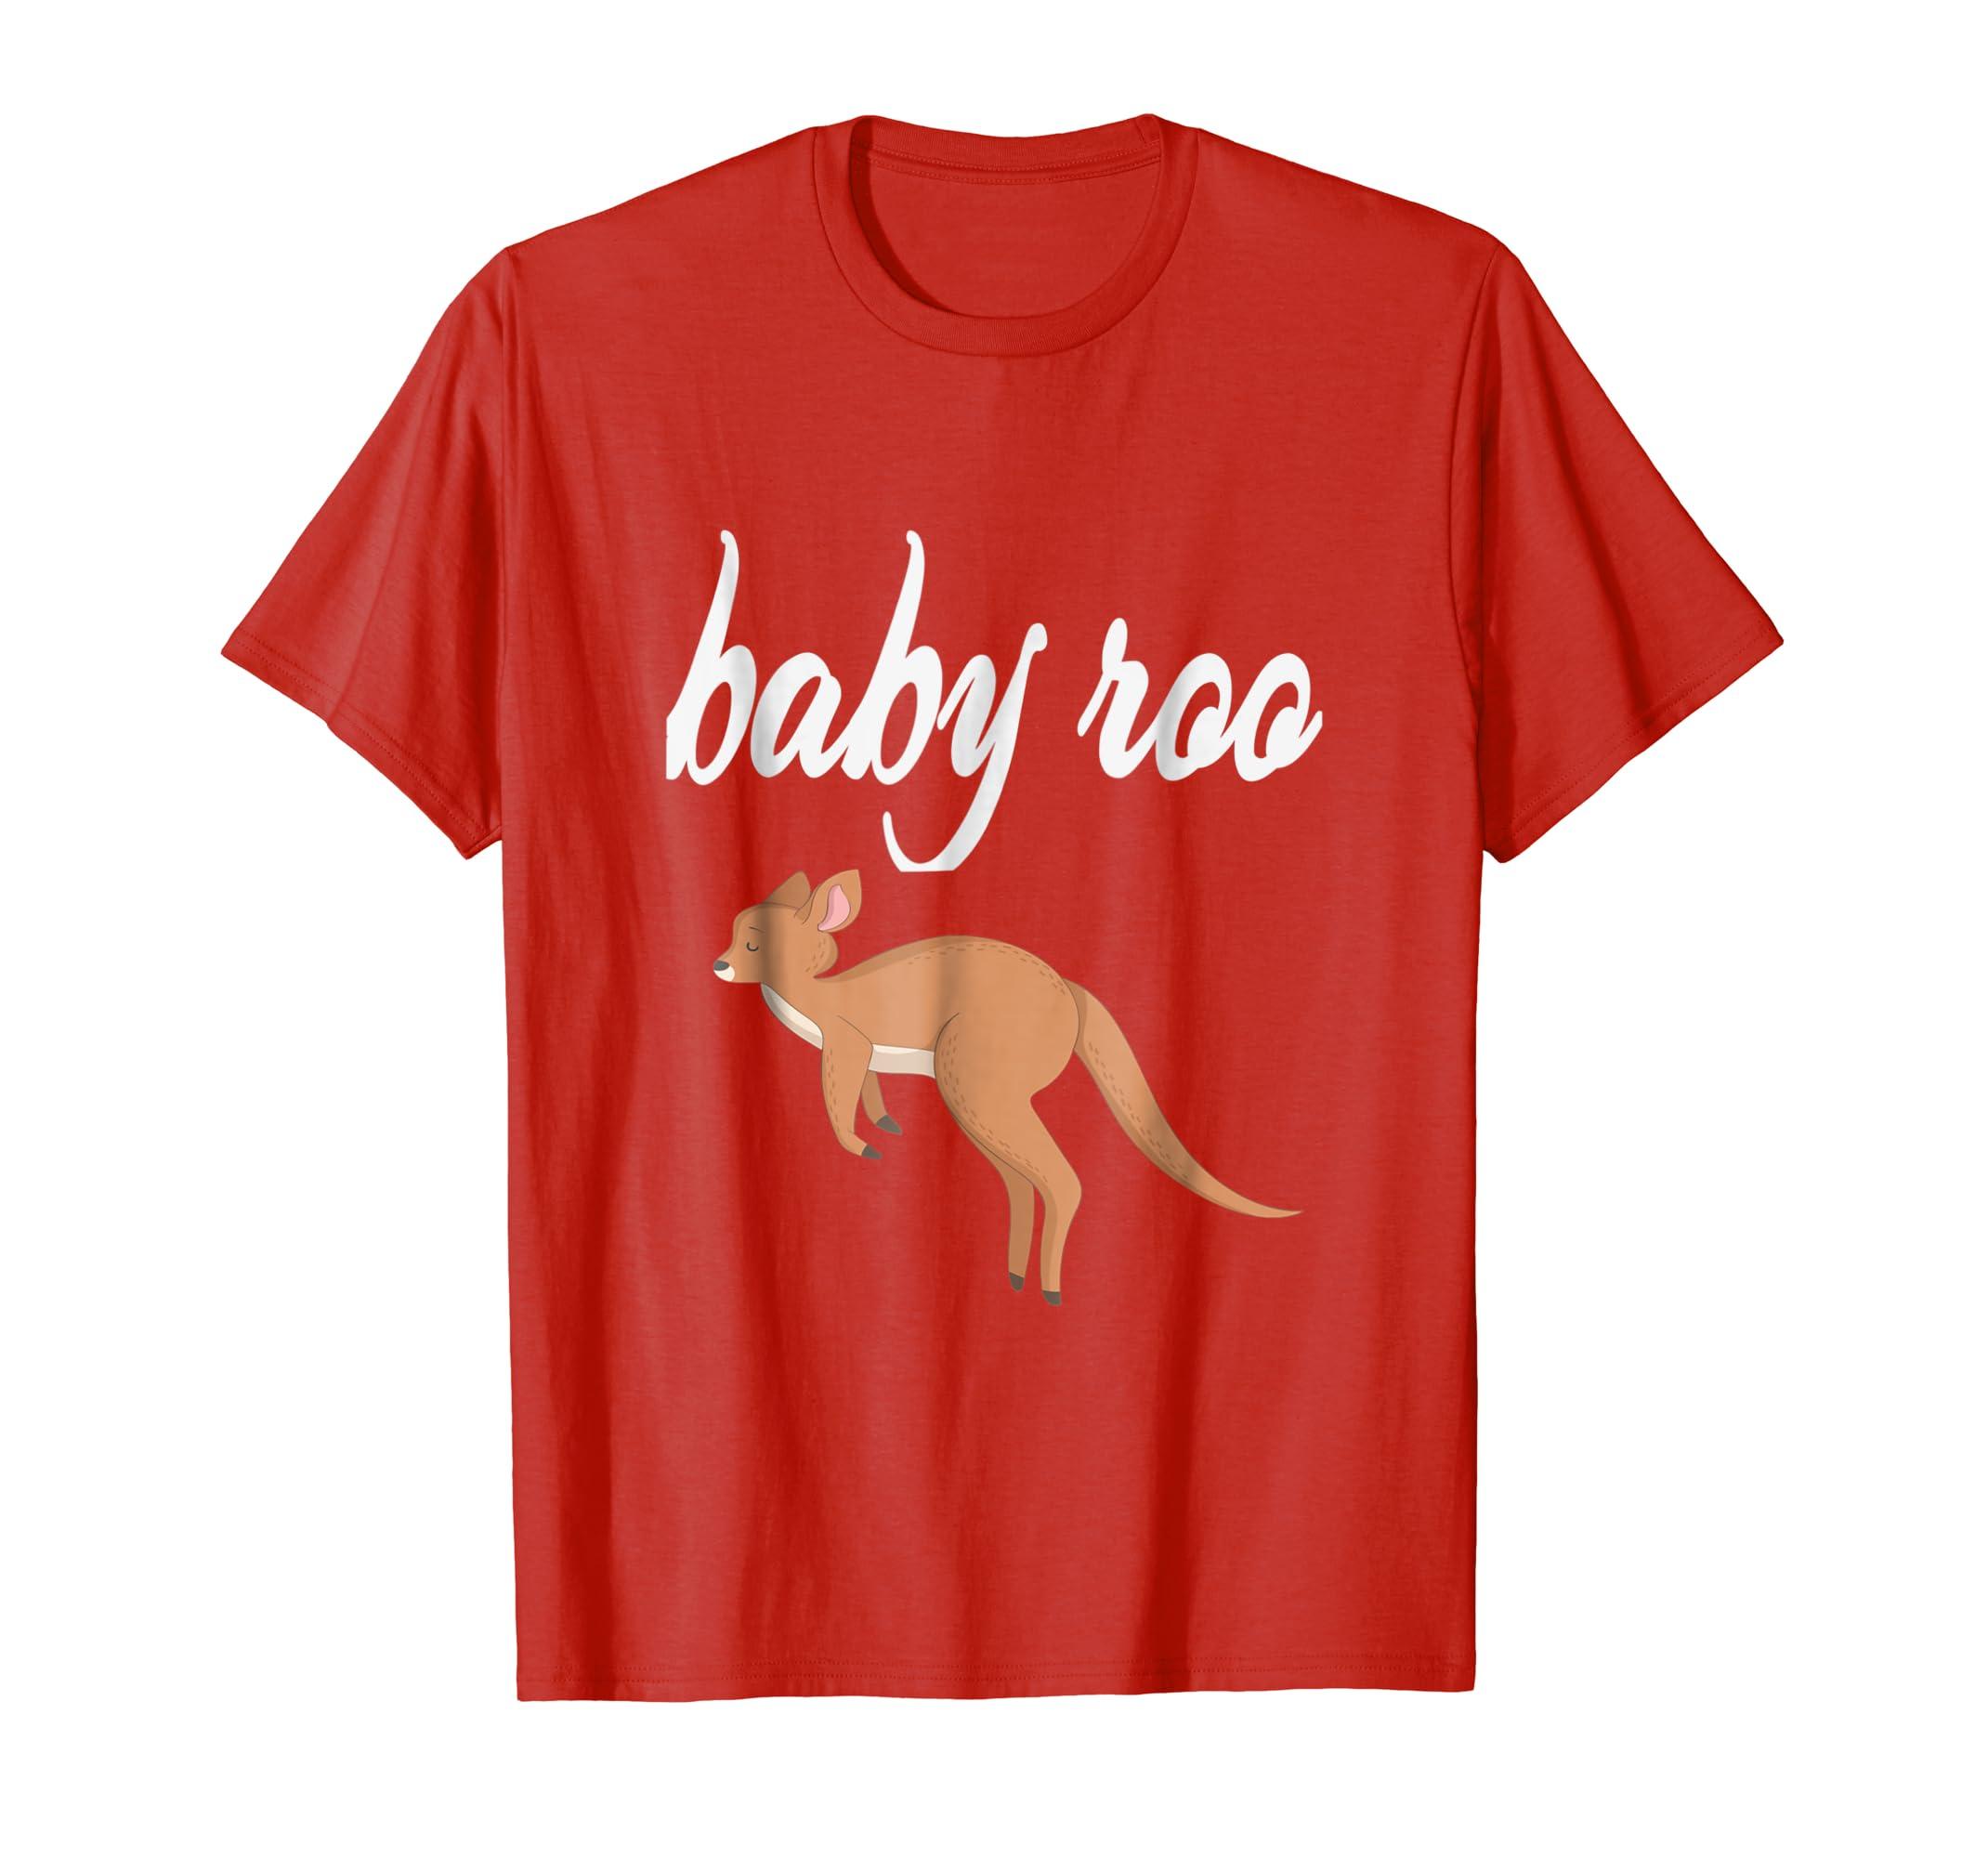 Baby Penguin Pajamas Ugly Family Christmas Season Tshirt-Teechatpro.   19.80. Baby Roo Kangaroo Funny Cute Family Aussie Group Gift-Teechatpro 7ebc699c8